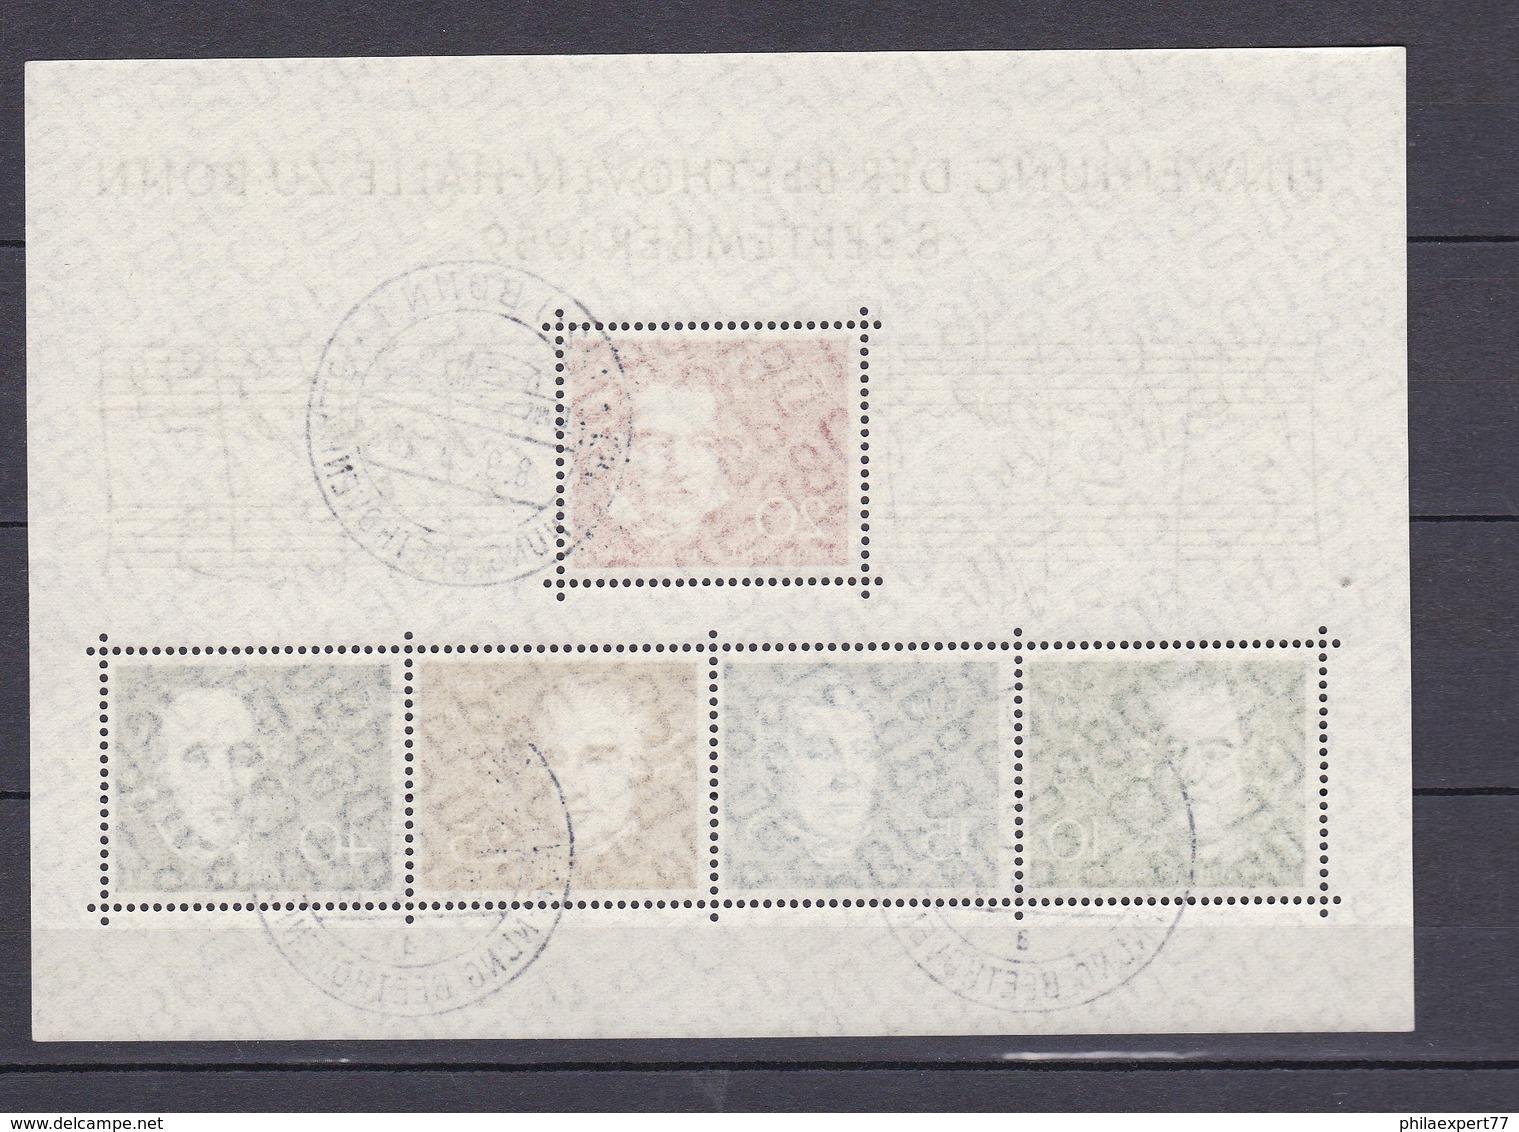 BRD - 1959 - Michel Nr. Block 2 - Gest. - 80 Euro - Gebraucht